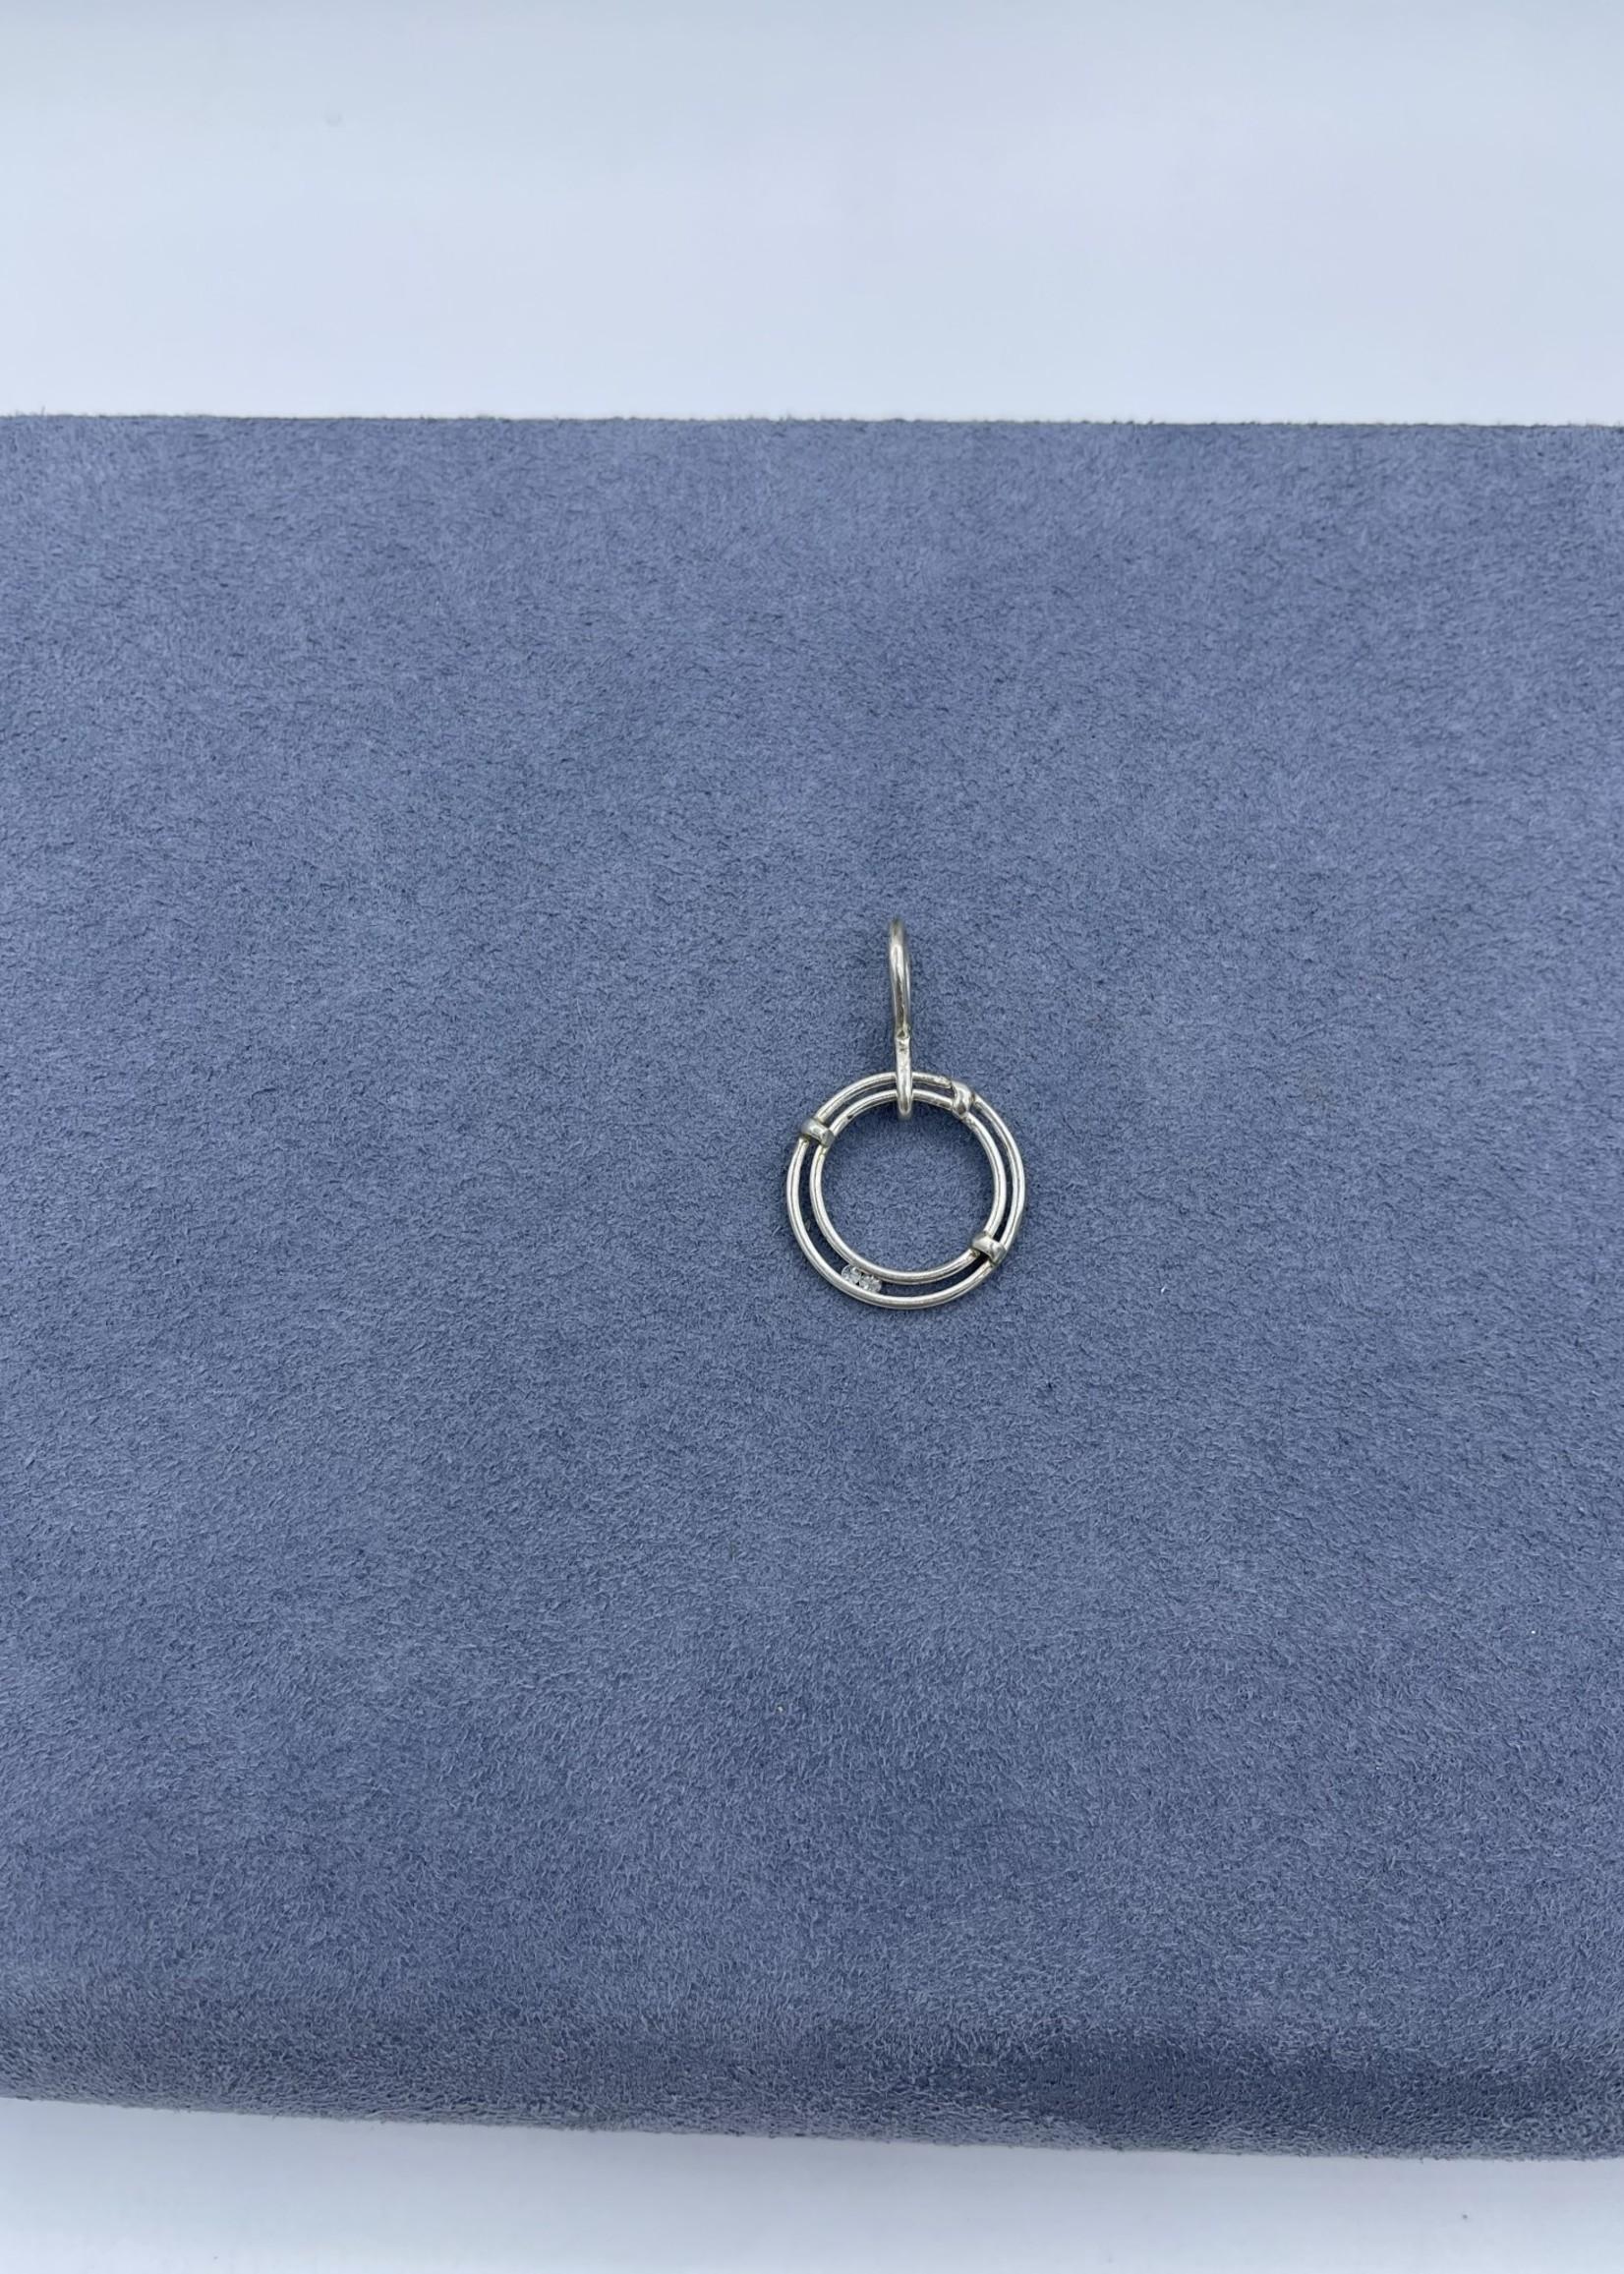 CJ Designs Silver Diamond Pendant